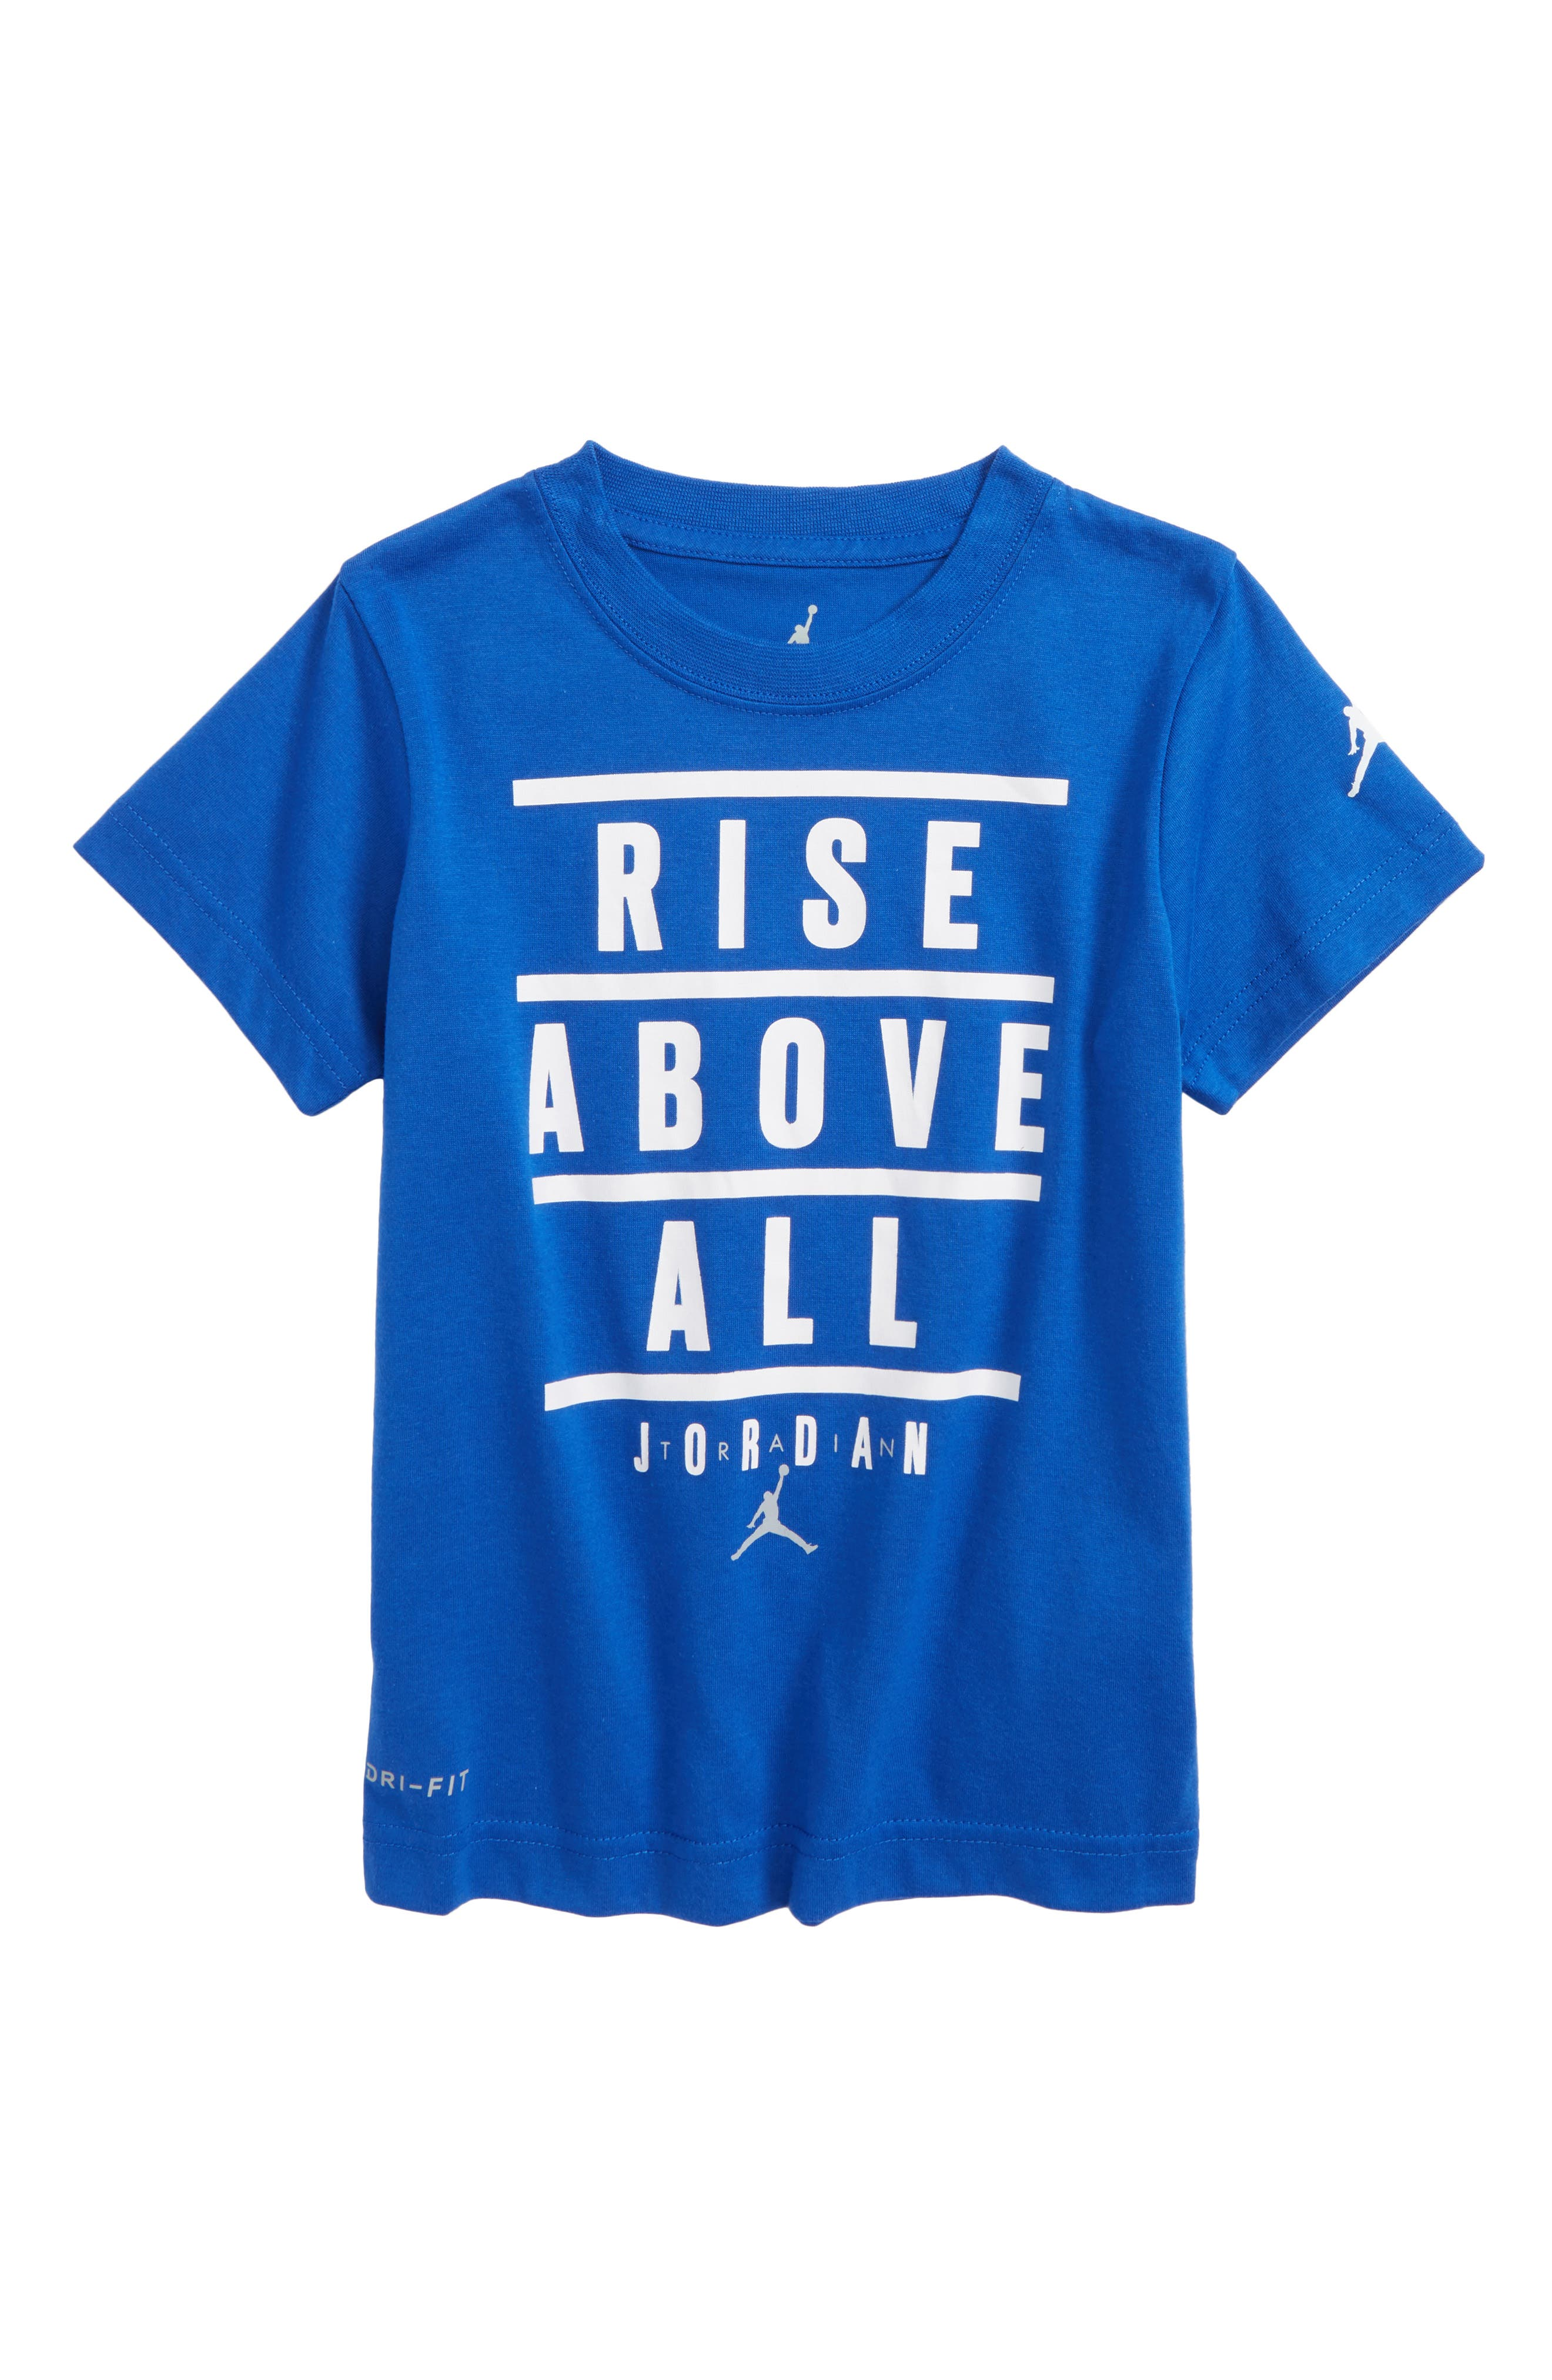 Jordan Motivational Dri-FIT T-Shirt,                             Main thumbnail 1, color,                             Hyper Royal